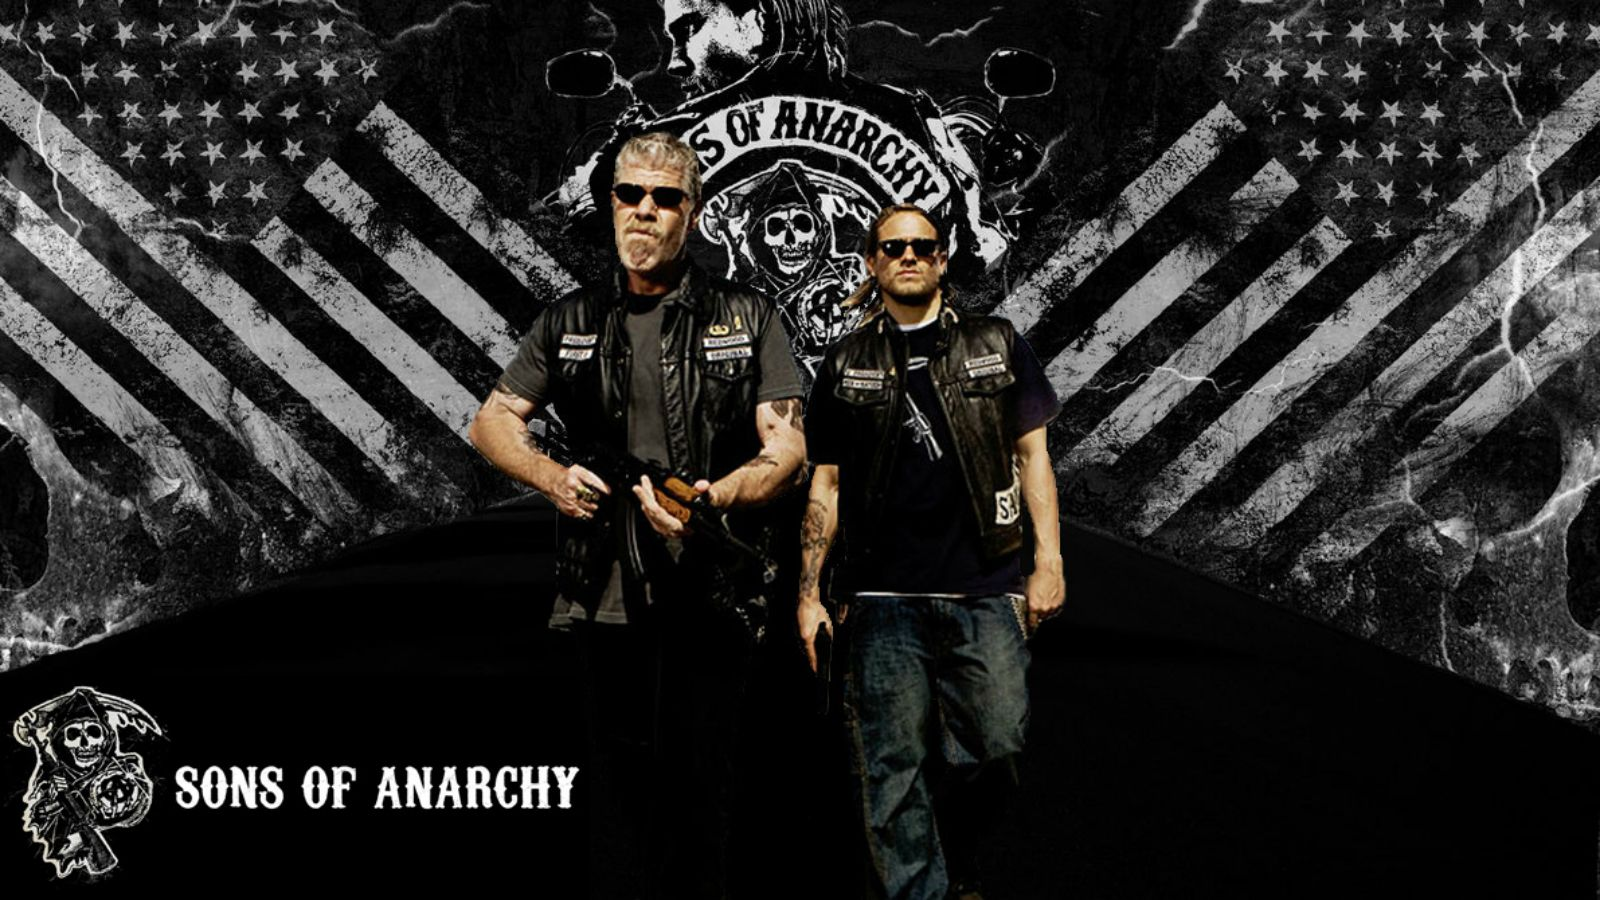 Sons Of Anarchy Hd 9 Sons Of Anarchy Anarchy Sons Of Anarchy Samcro